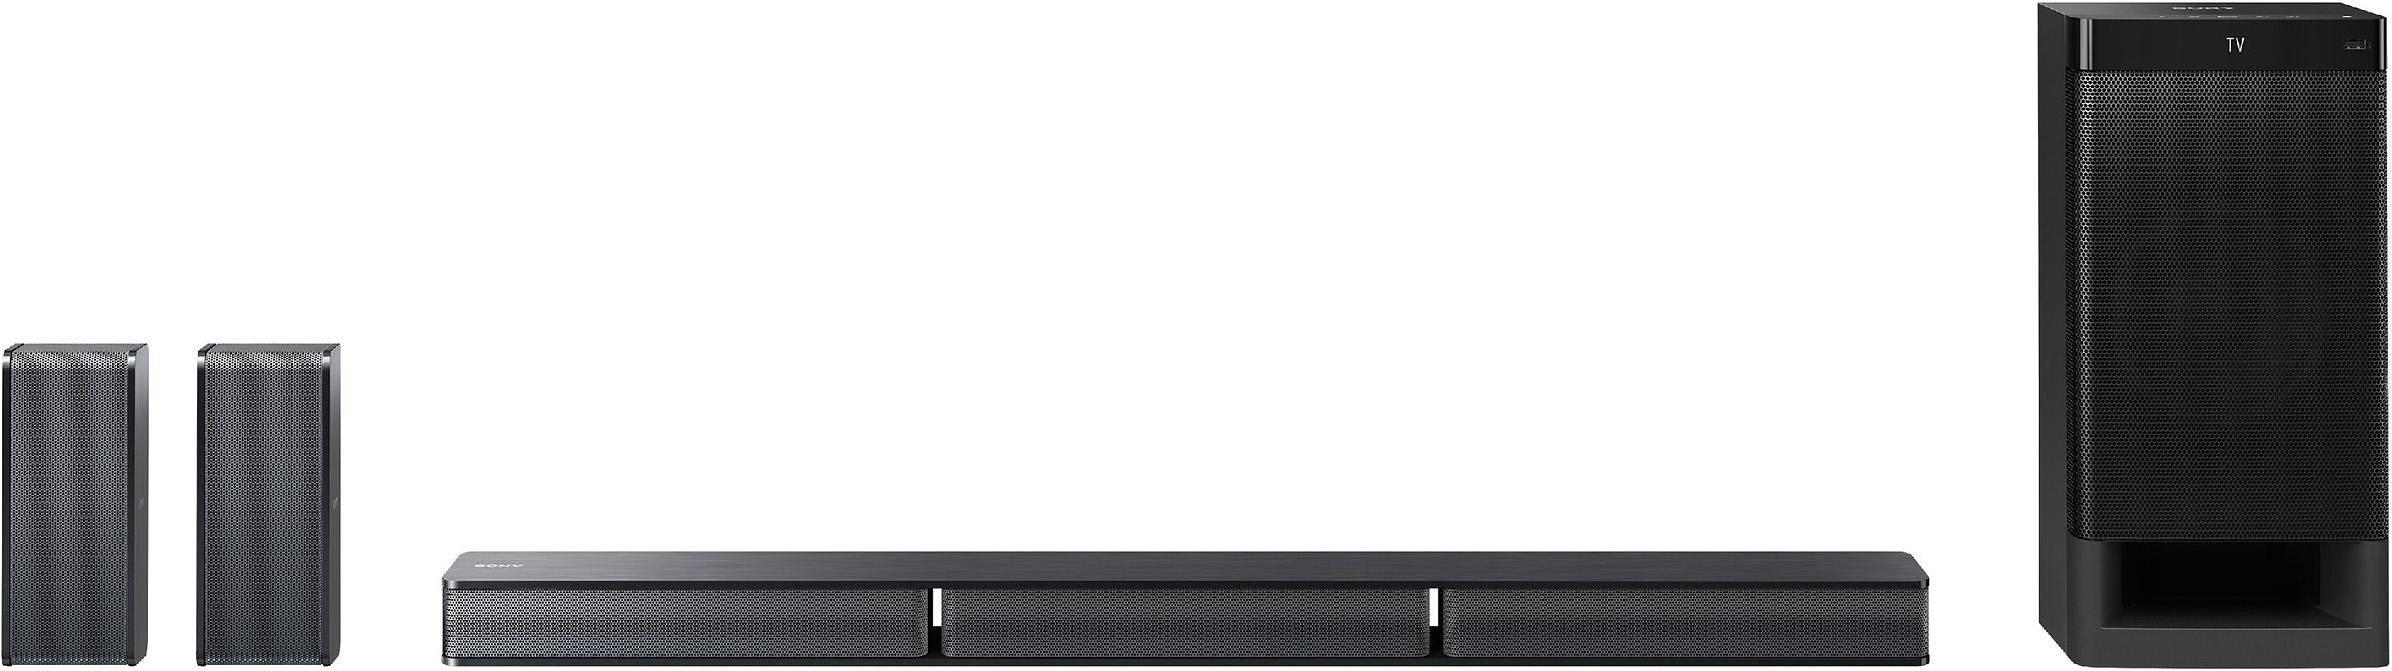 HT-RT3 5.1 Soundbar, Bluetooth, NFC, USB